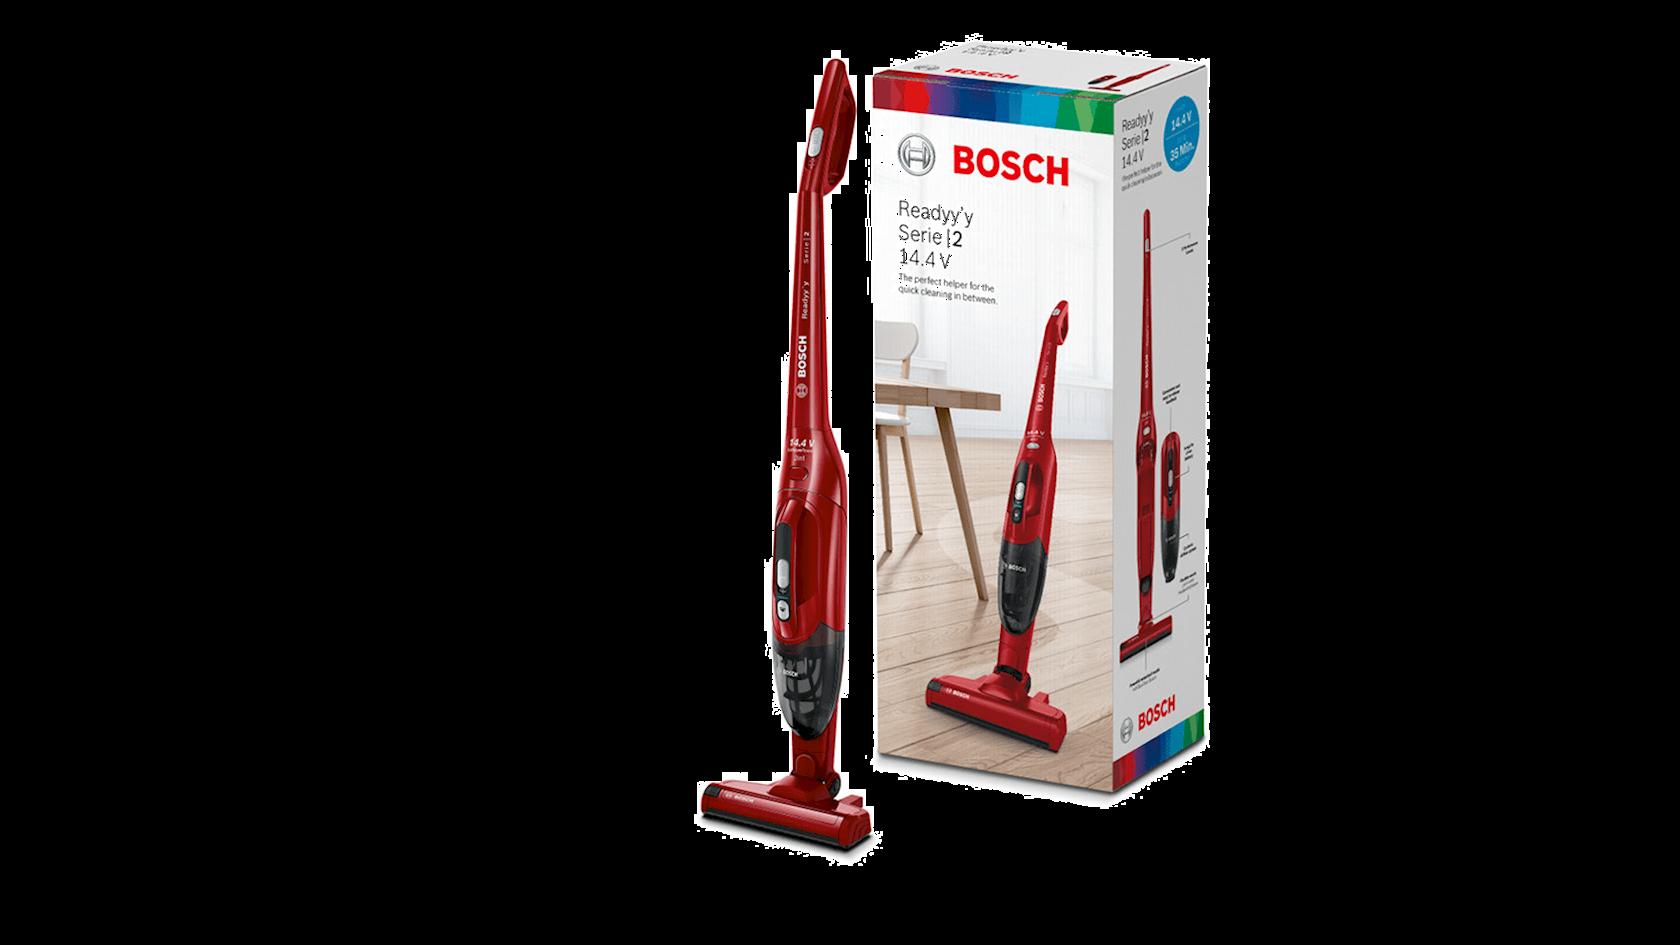 Vertikal akkumulyator tozsoranı Bosch BBHF214R